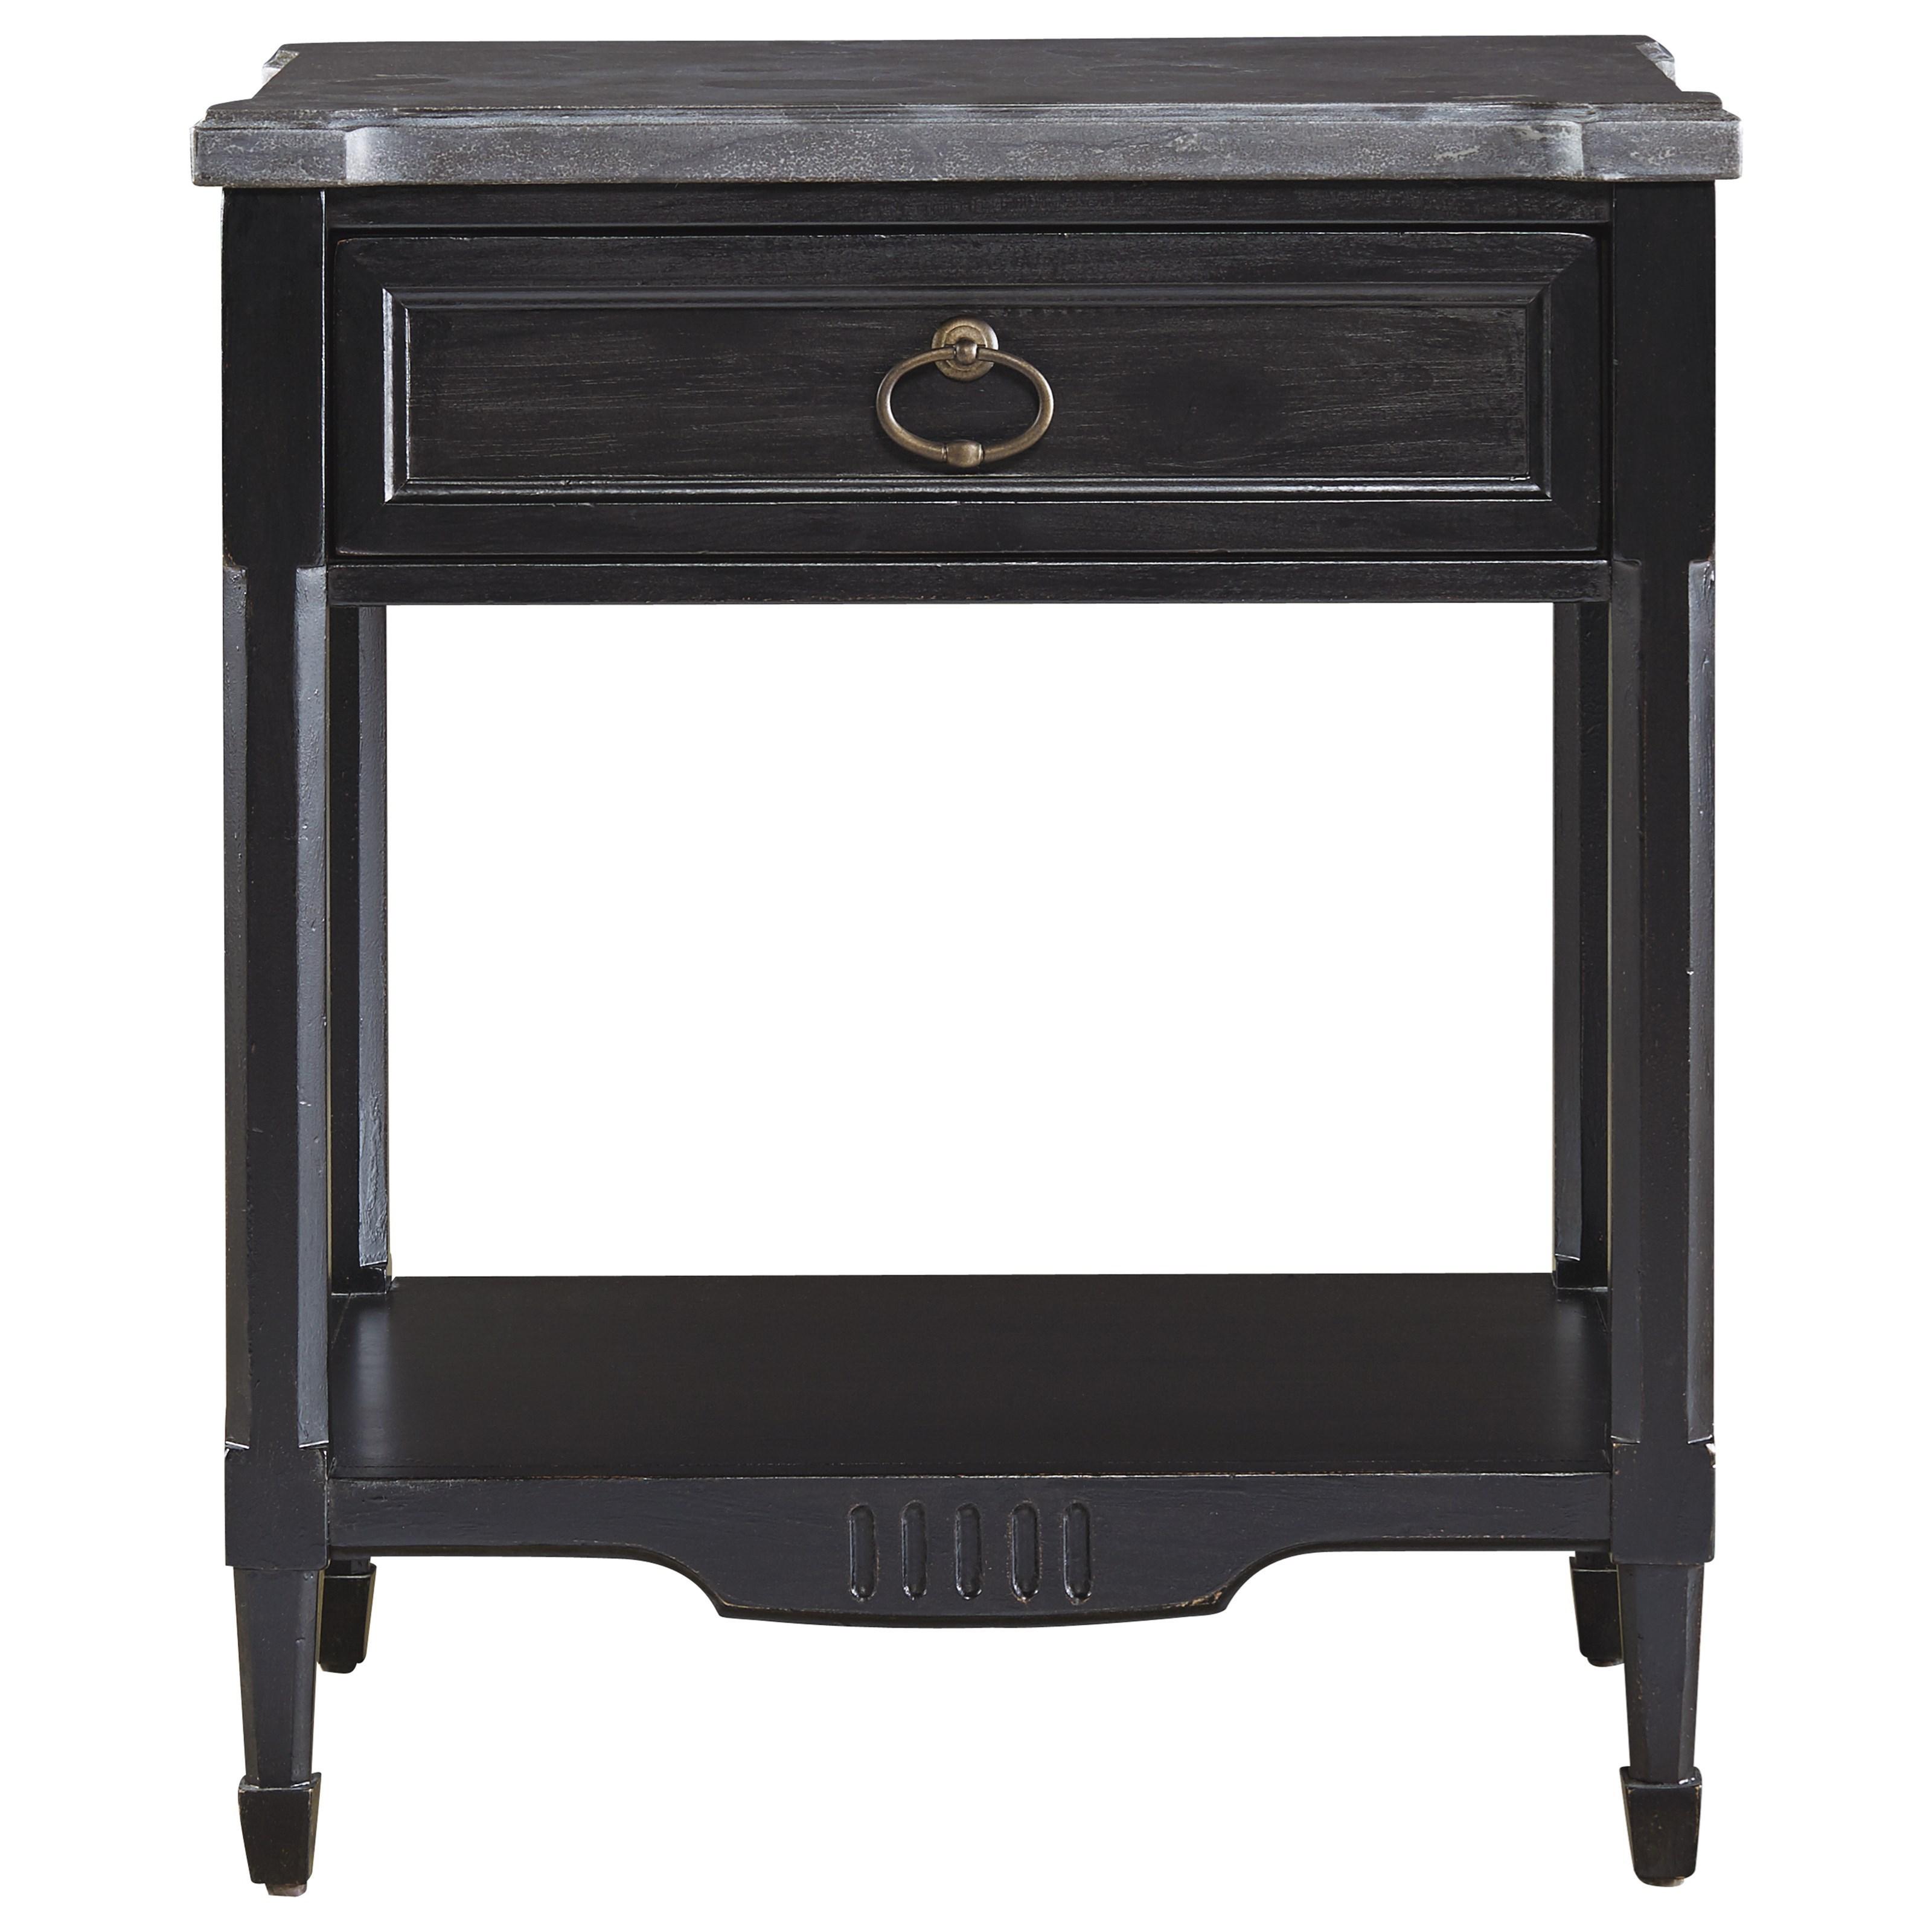 Morris Home Furnishings Gramercy Park Gramercy Park Bedside Table - Item Number: 572A355